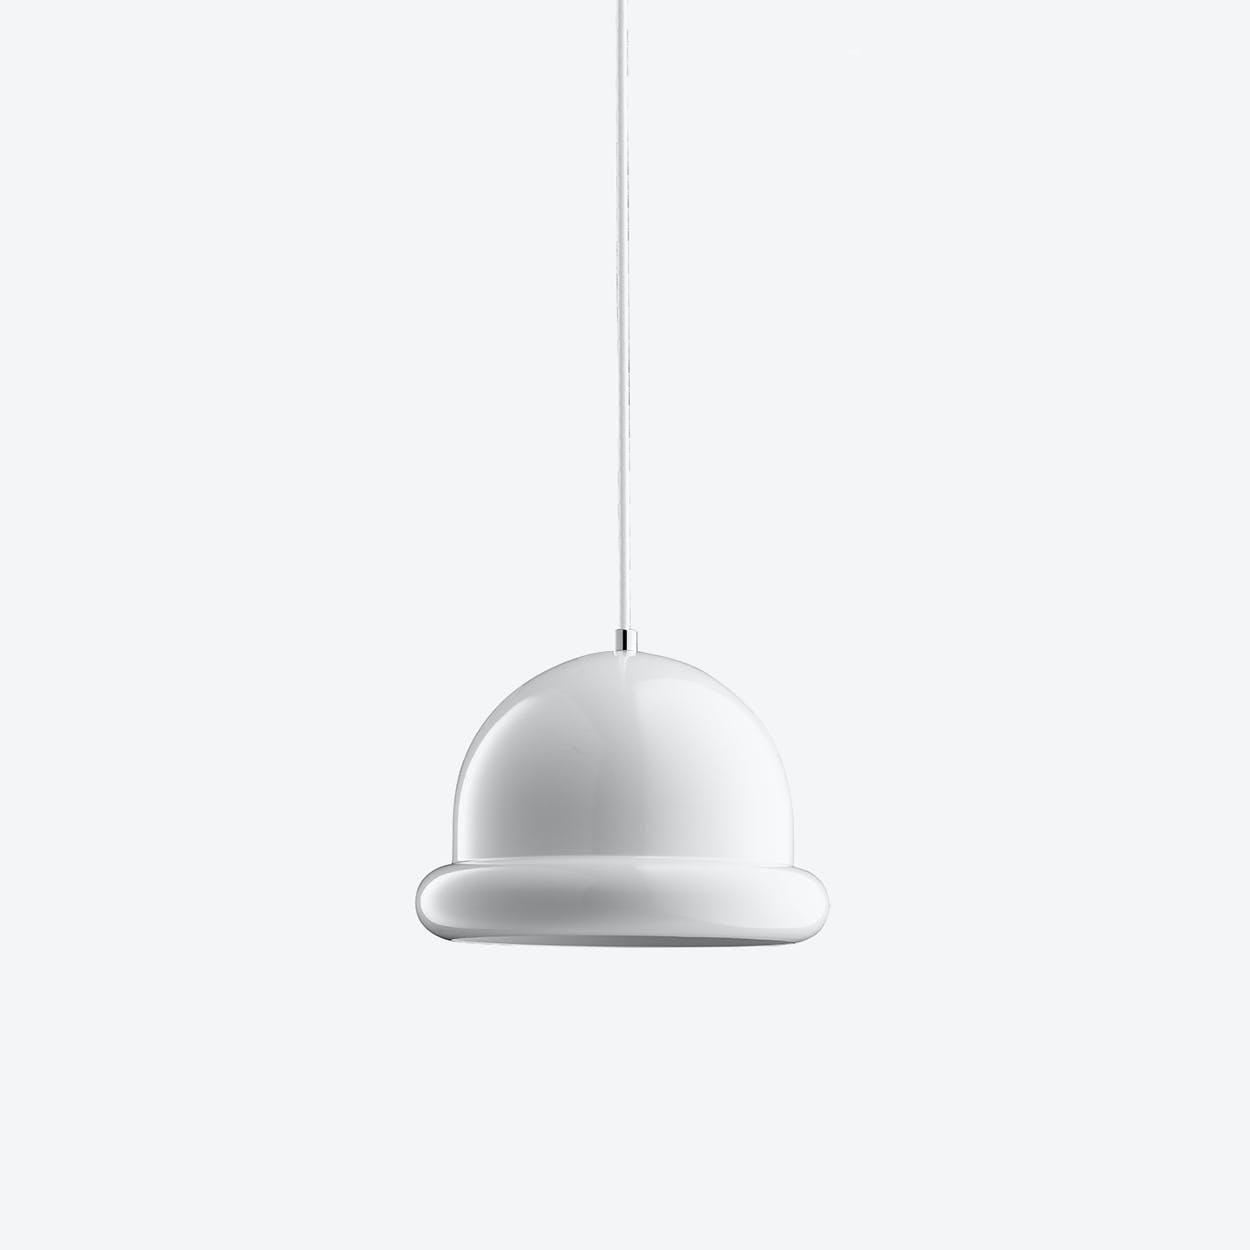 Hattrick Pendant Lamp in White